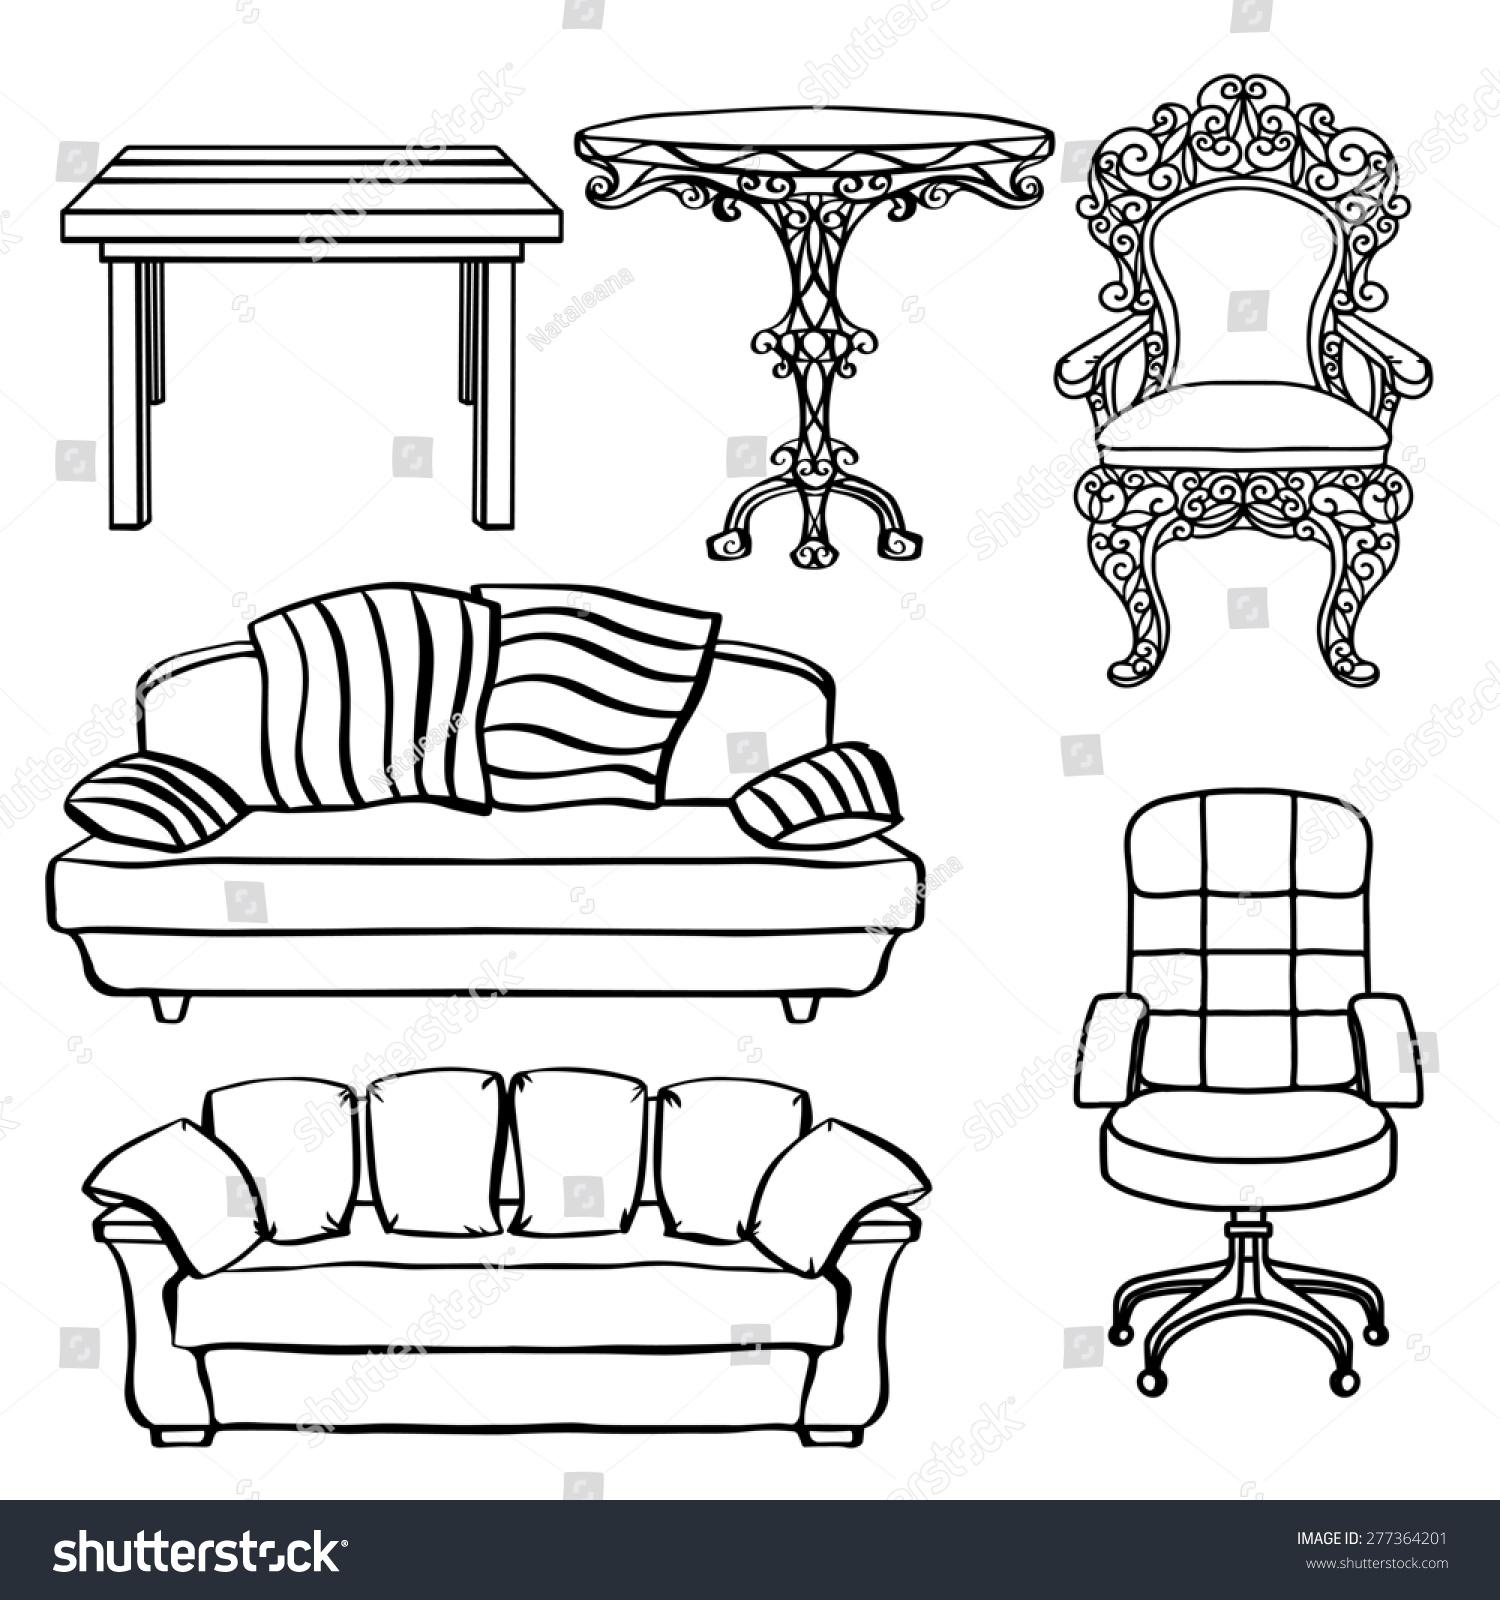 Furniture Set Armchair Sofa Table Chair Stock Illustration